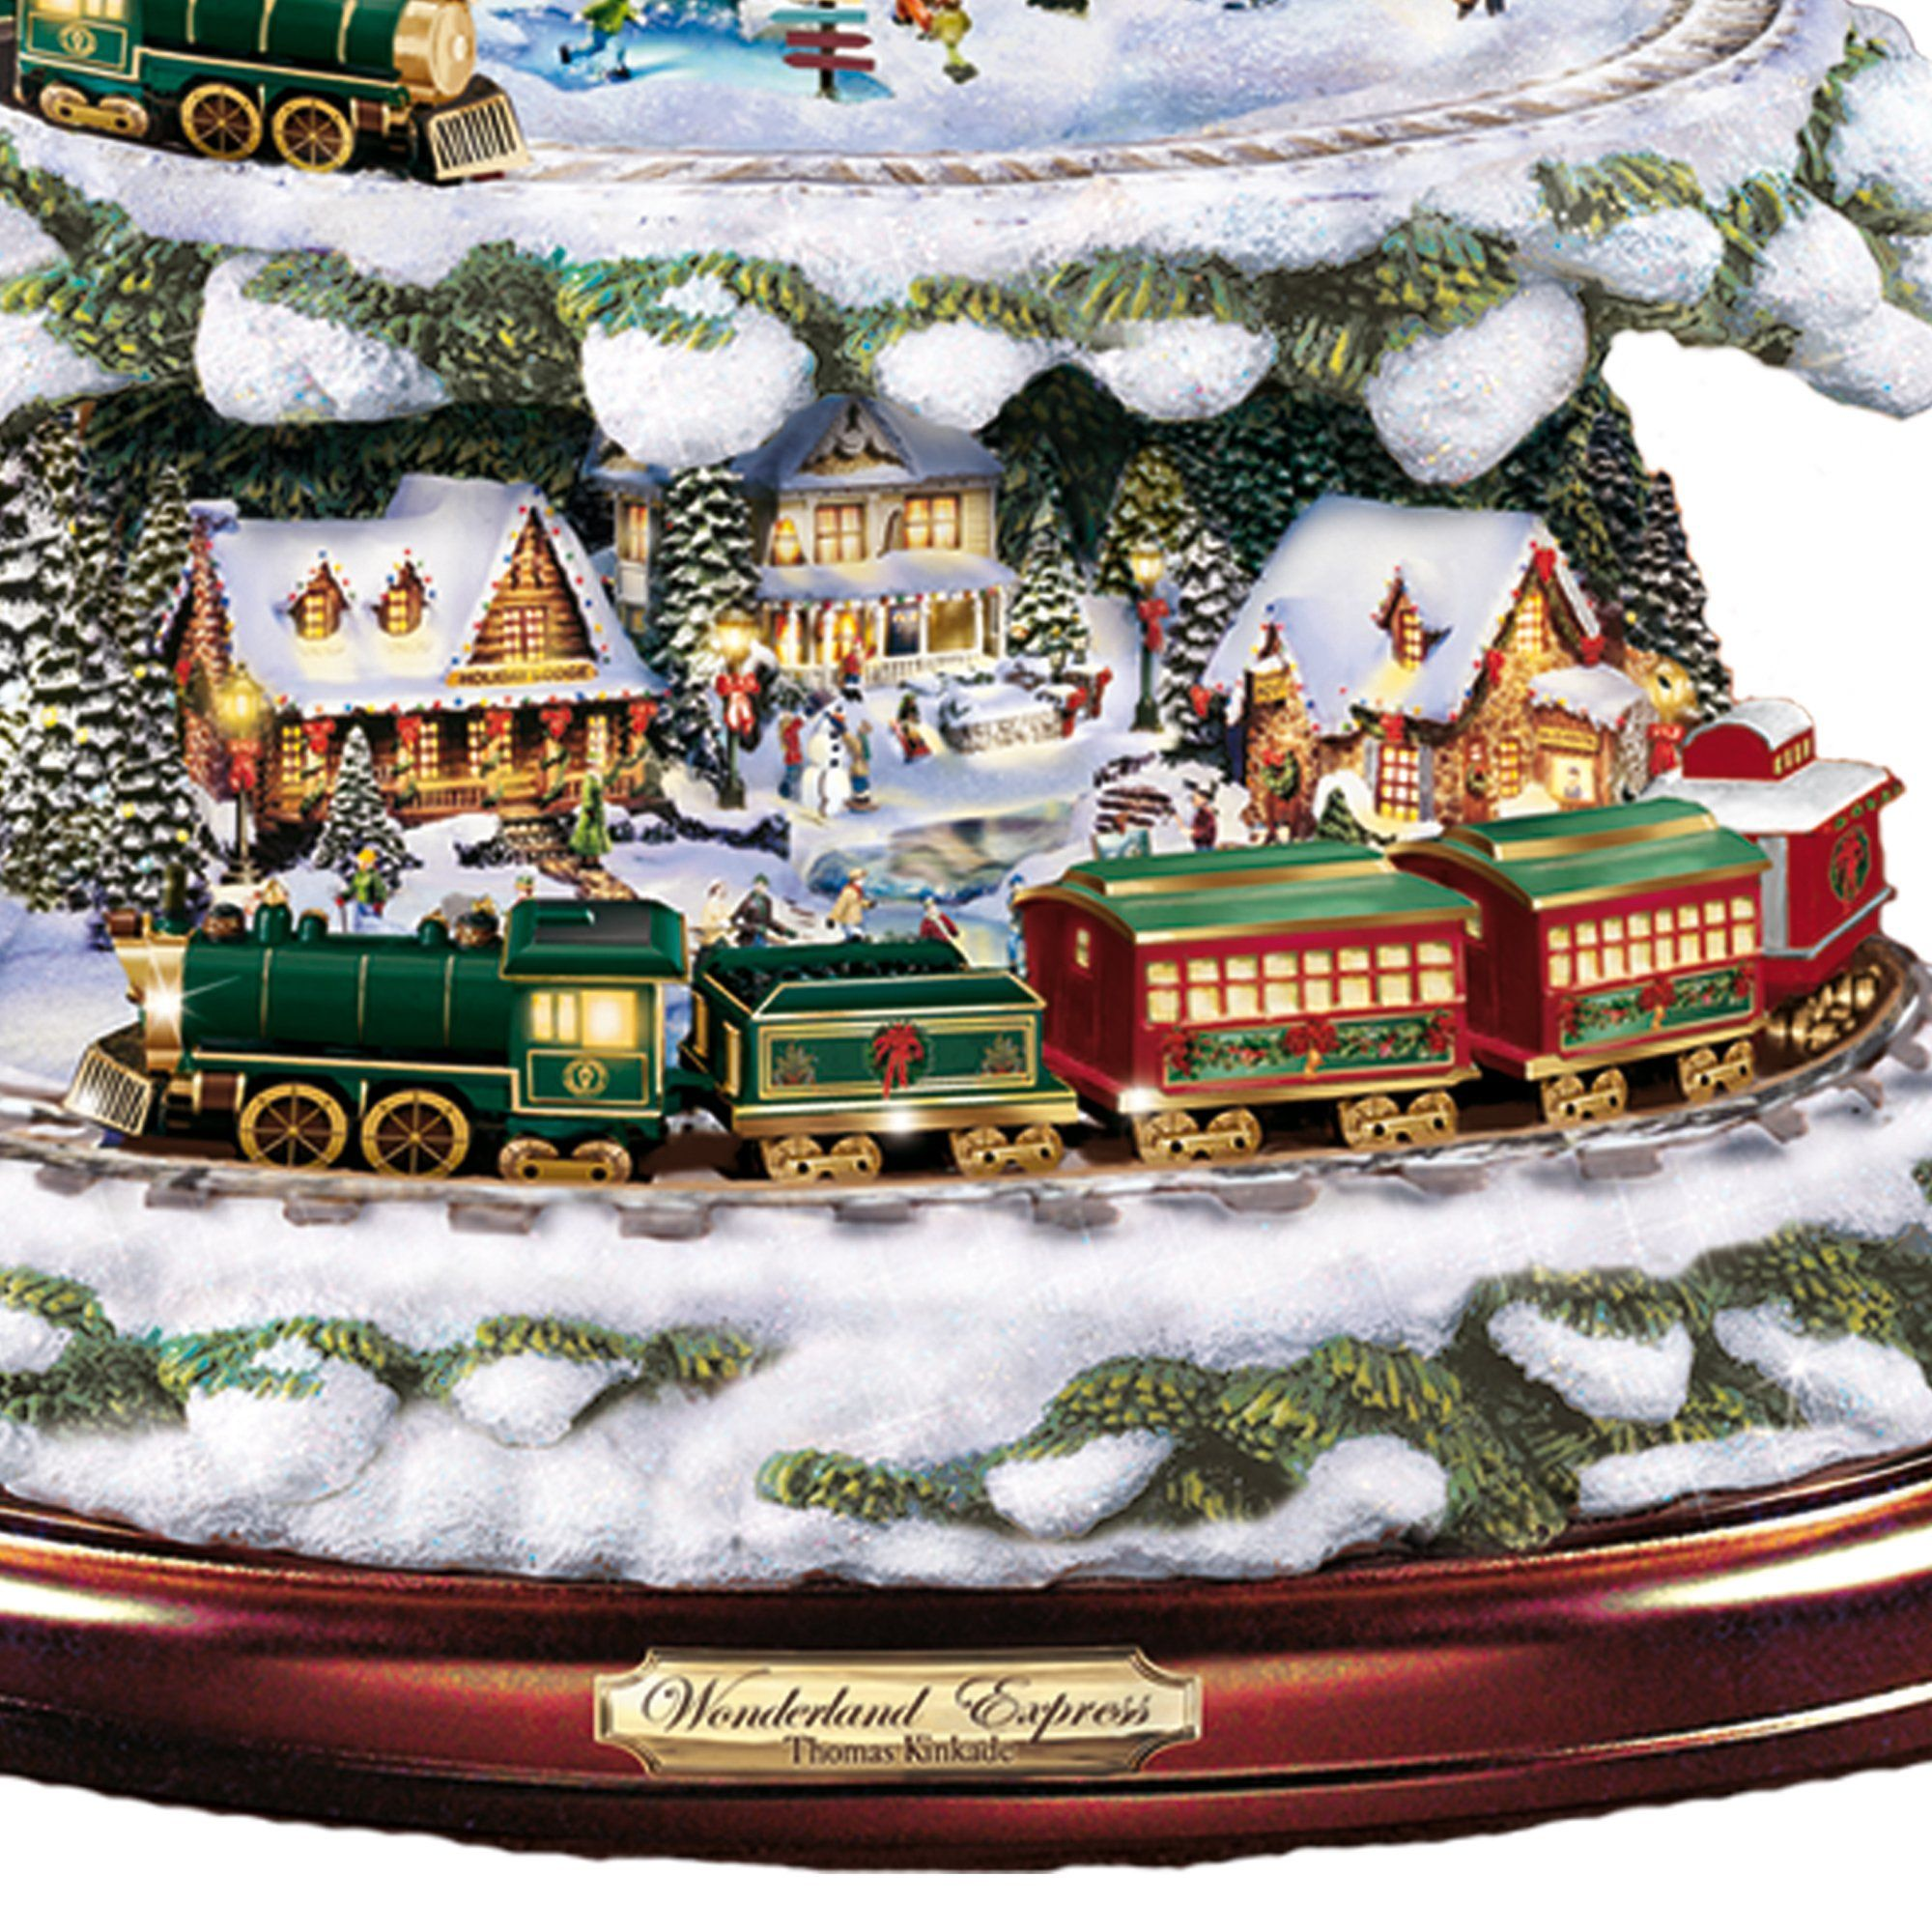 Thomas kinkade o holy night christmas stocking - Thomas Kinkade Wonderland Express Christmas Tree With Lights Moving Train Music Amazon